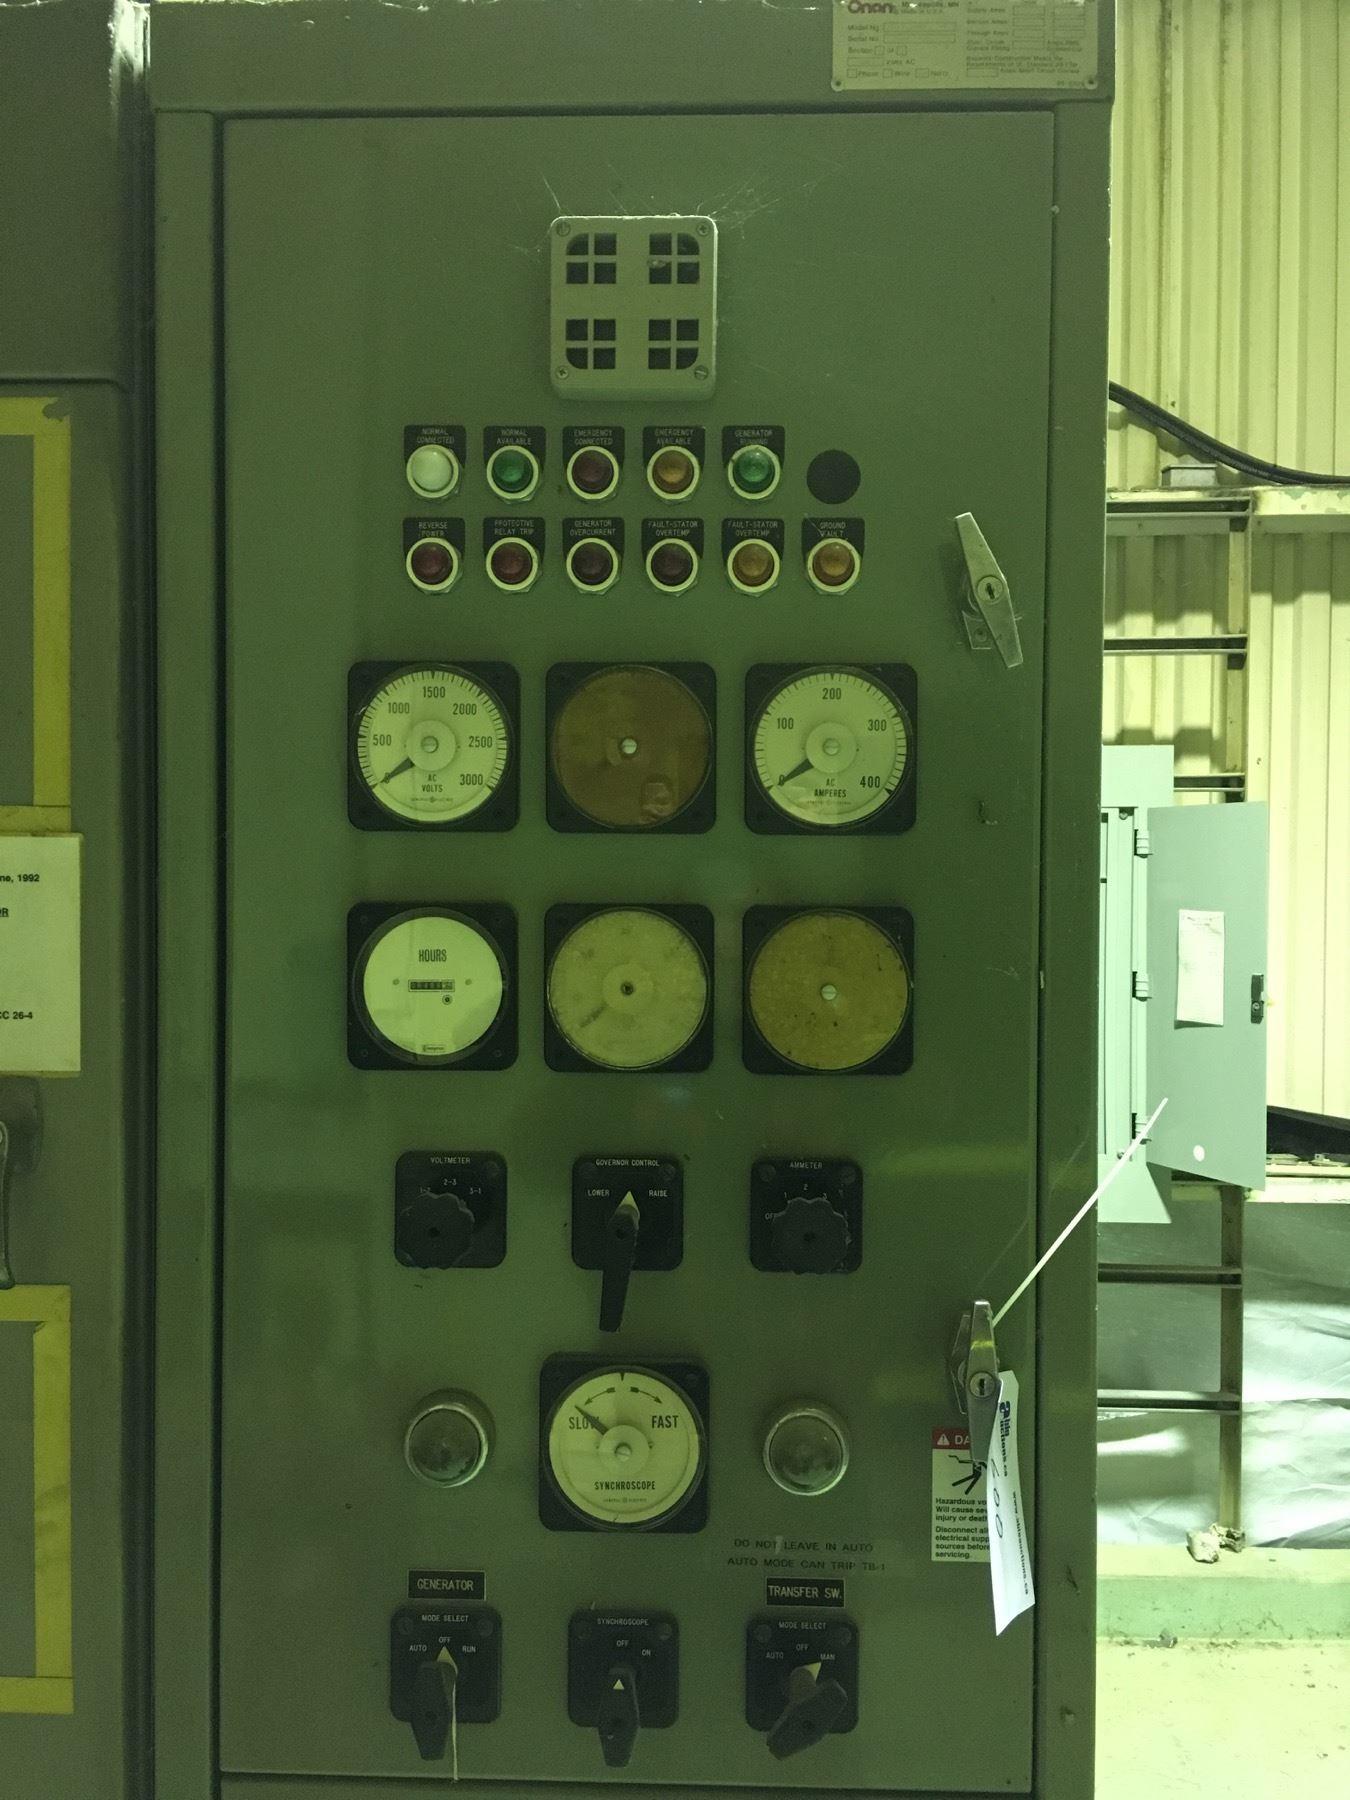 ONAN 1 MEGAWATT GENERATOR SET, MODEL 1000DFLA, SPEC  52357G, 3 PHASE